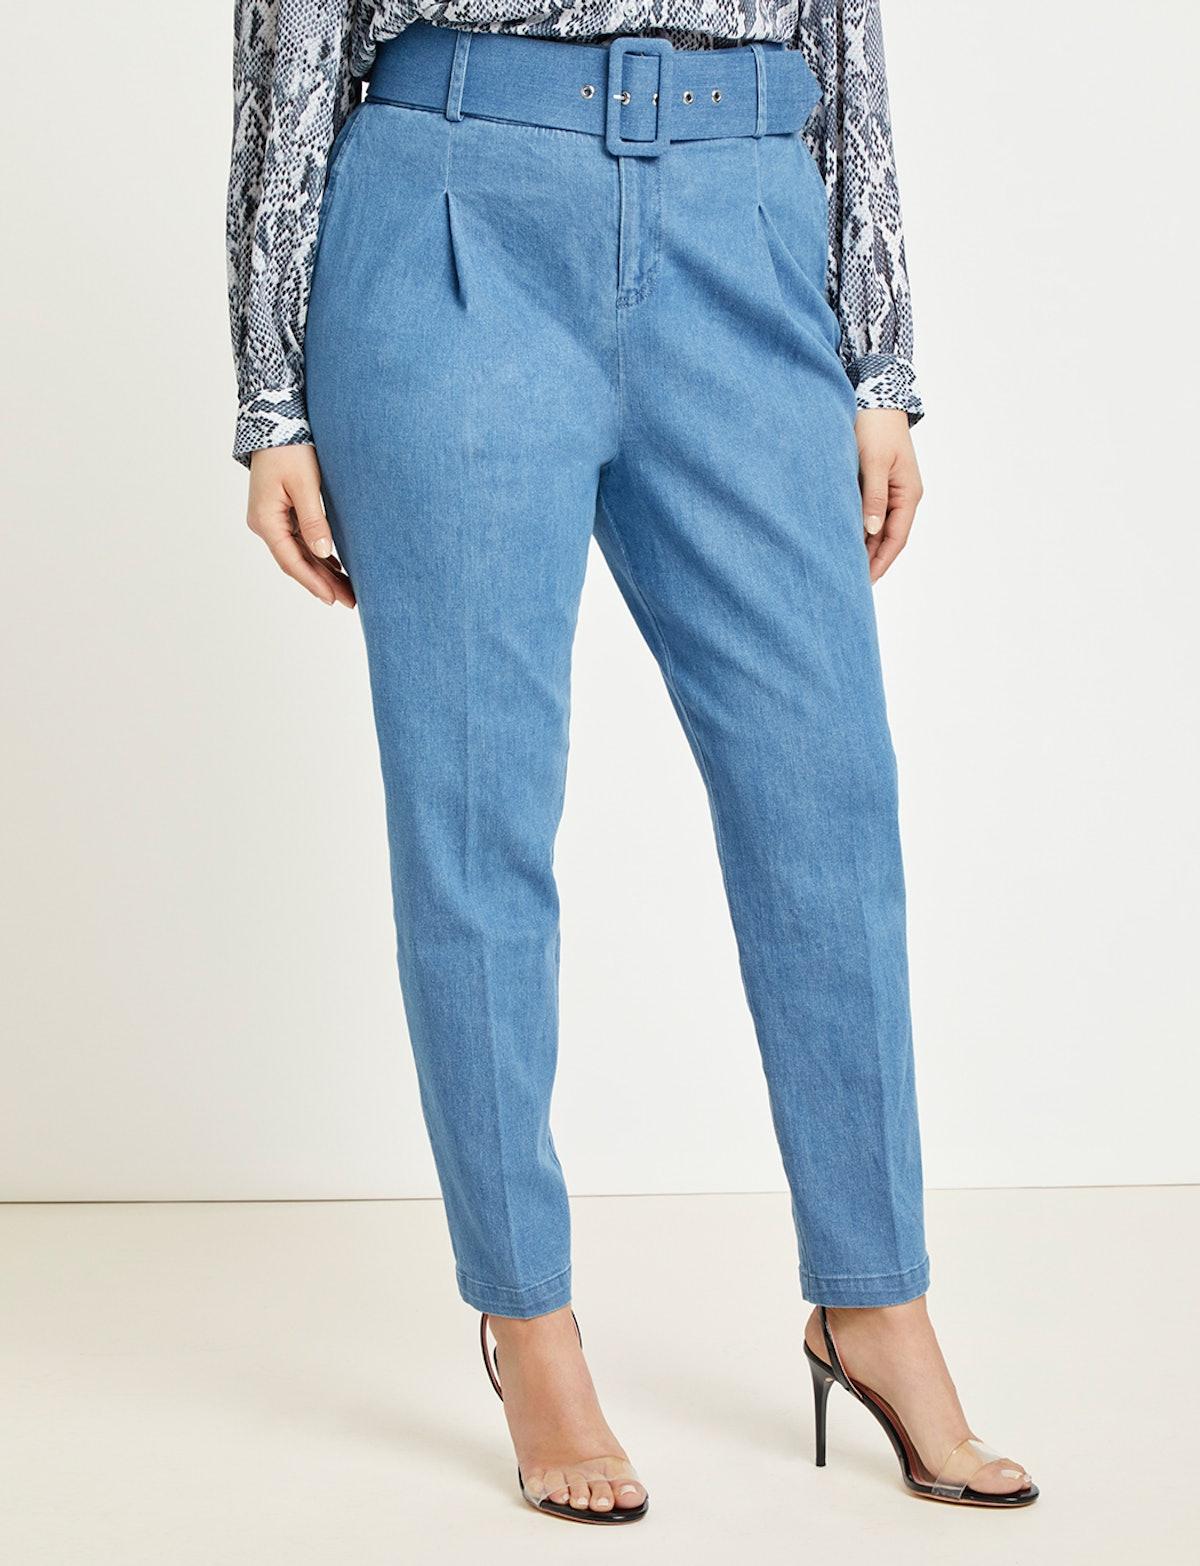 High Waisted Denim Trouser with Belt